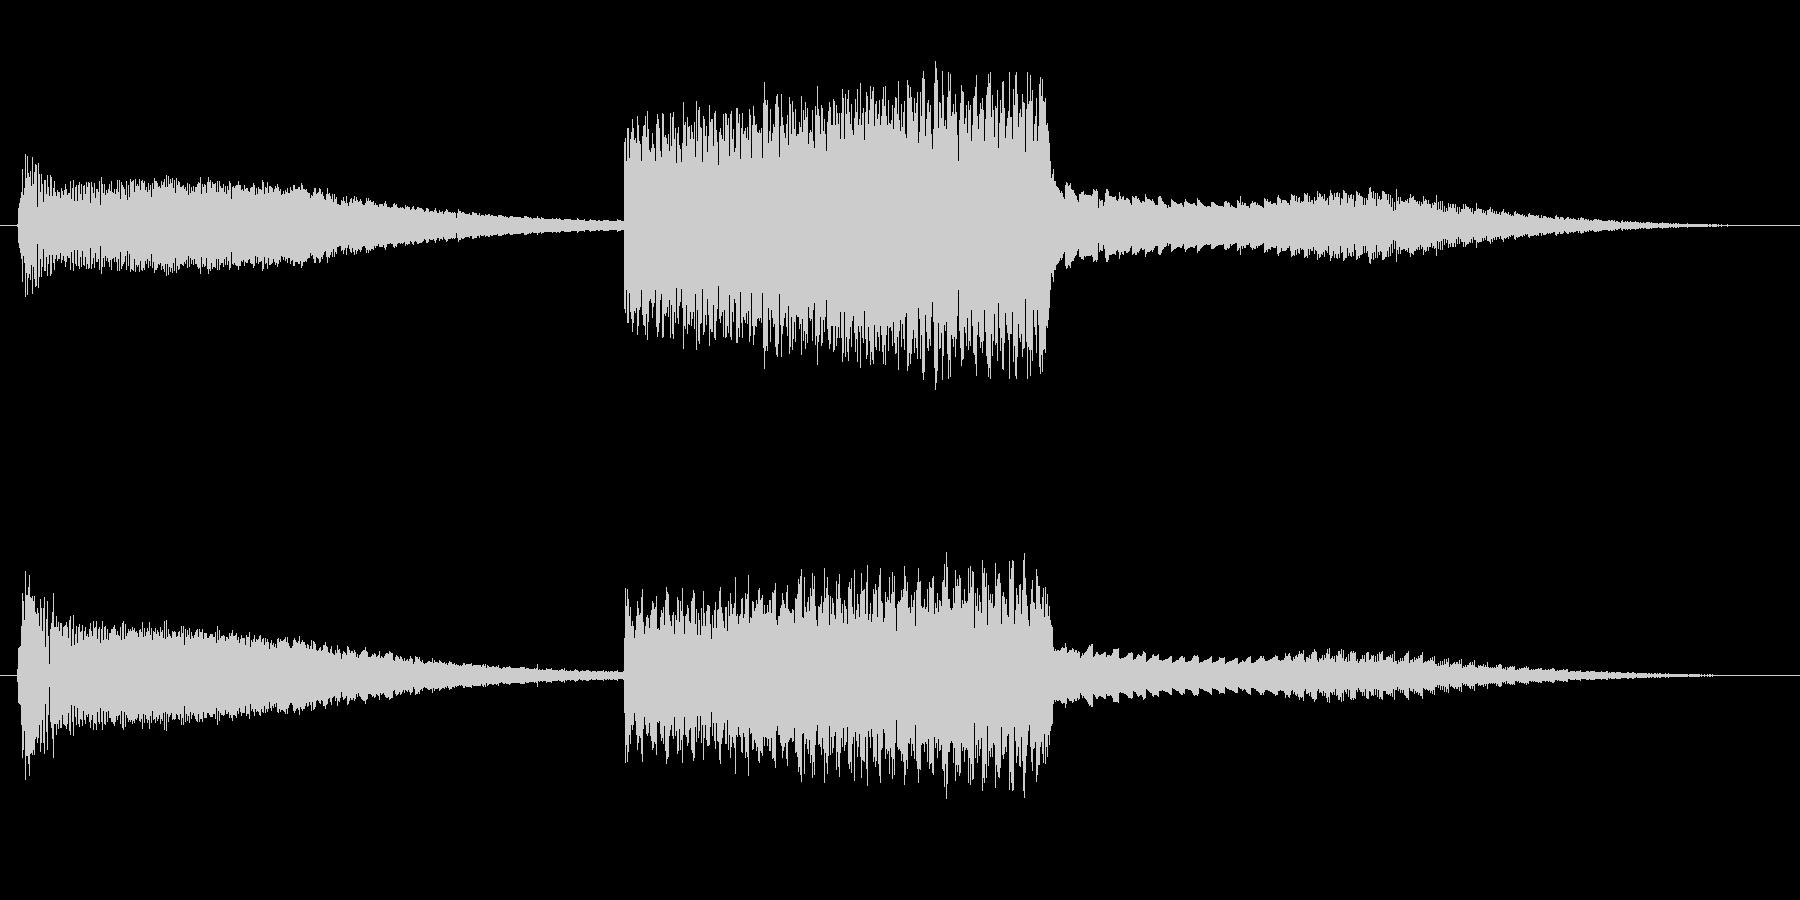 FI デバイス ライズフォール02の未再生の波形